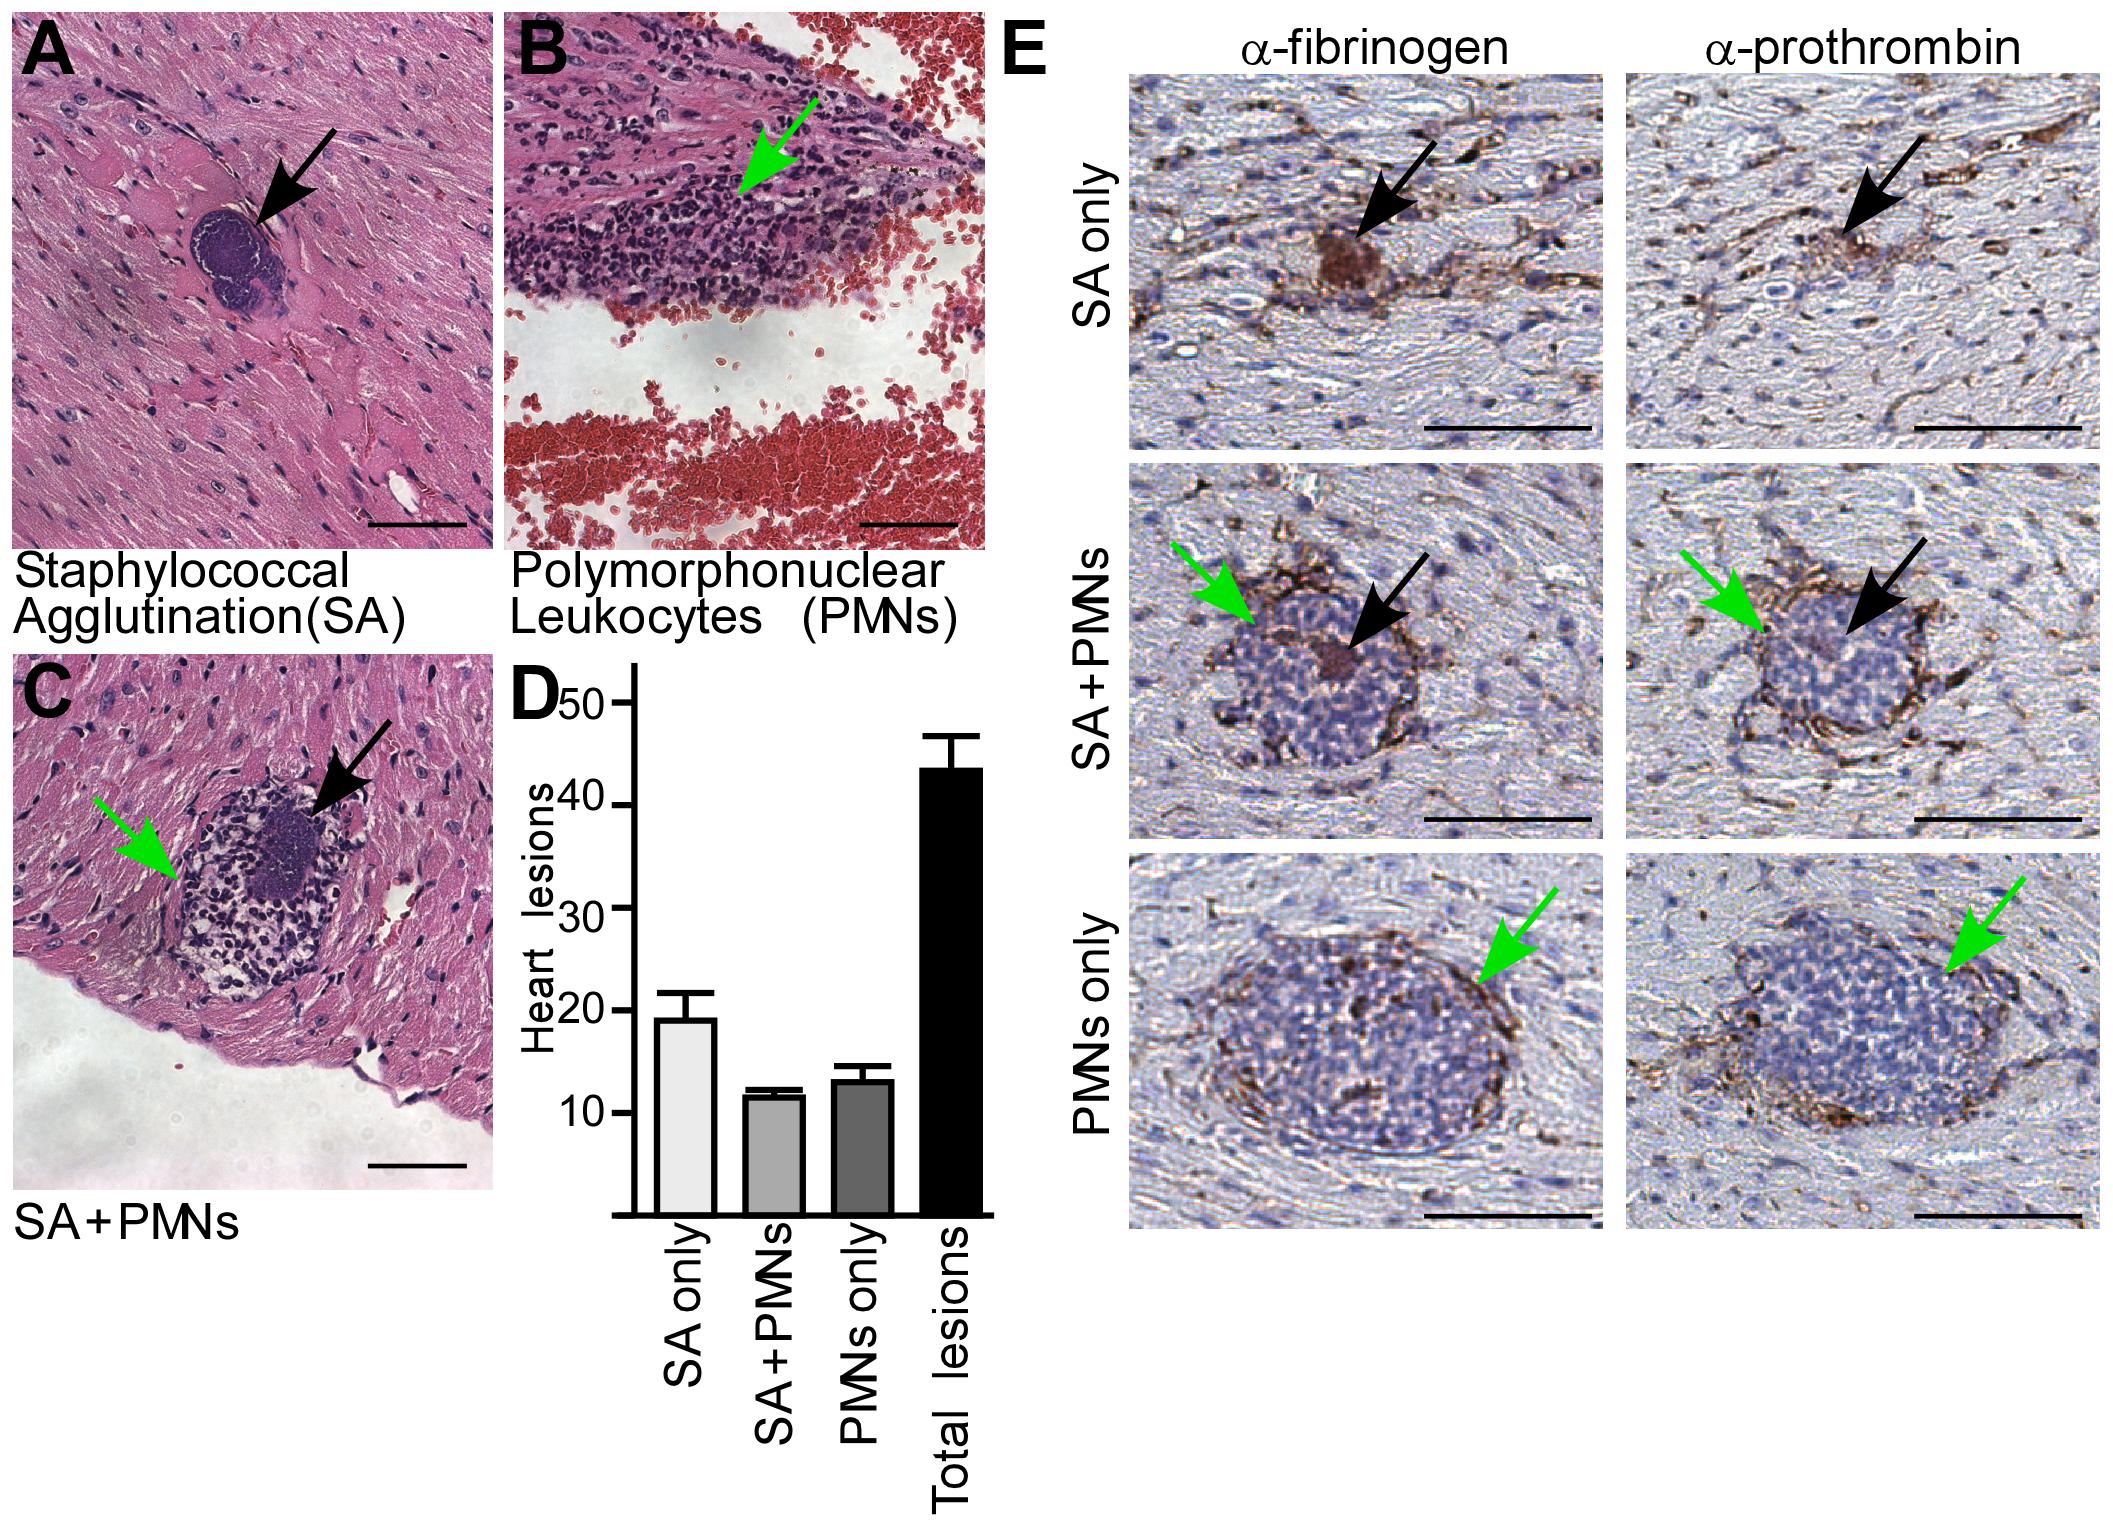 <i>Staphylococcus aureus</i> agglutination occurs during the pathogenesis of sepsis in mice.